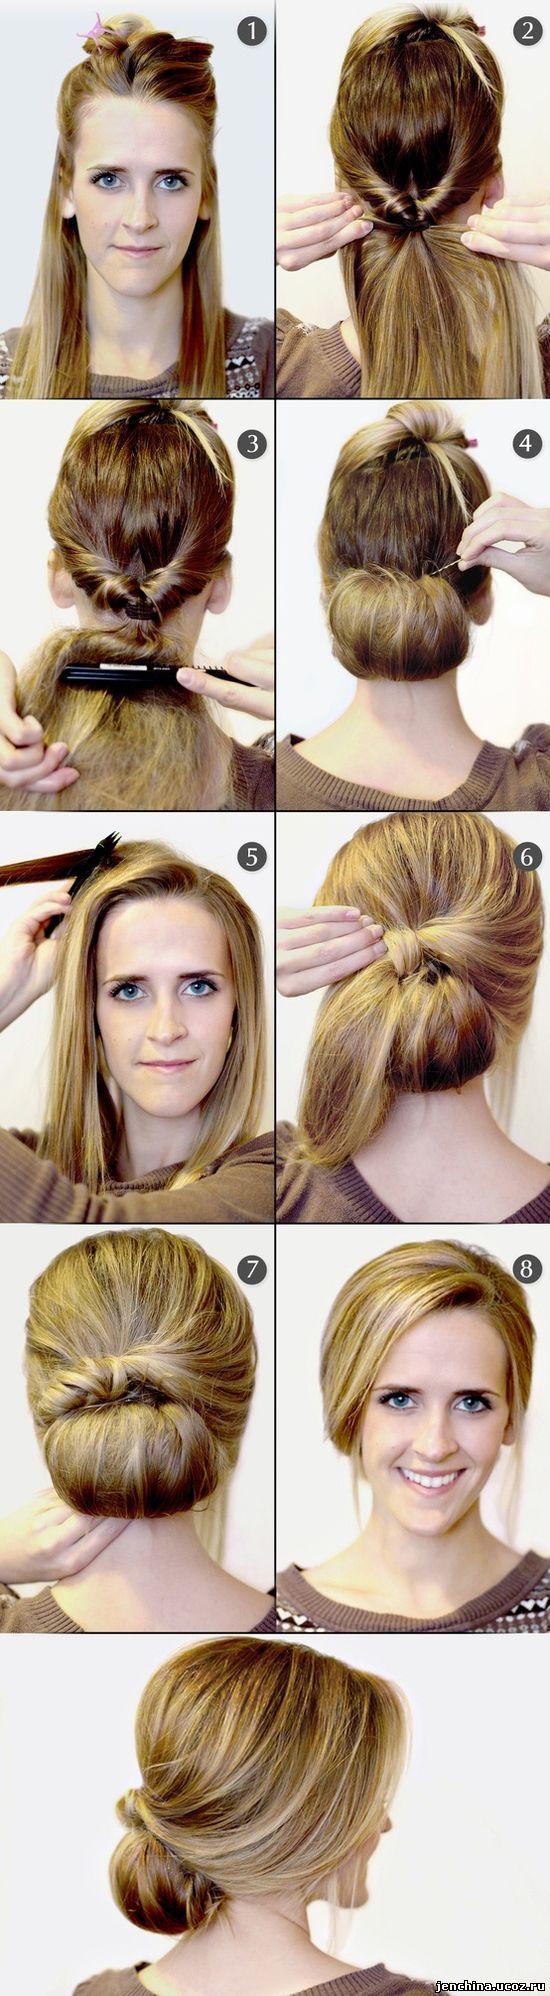 Причёски для средних волос в домашних условиях своими руками фото